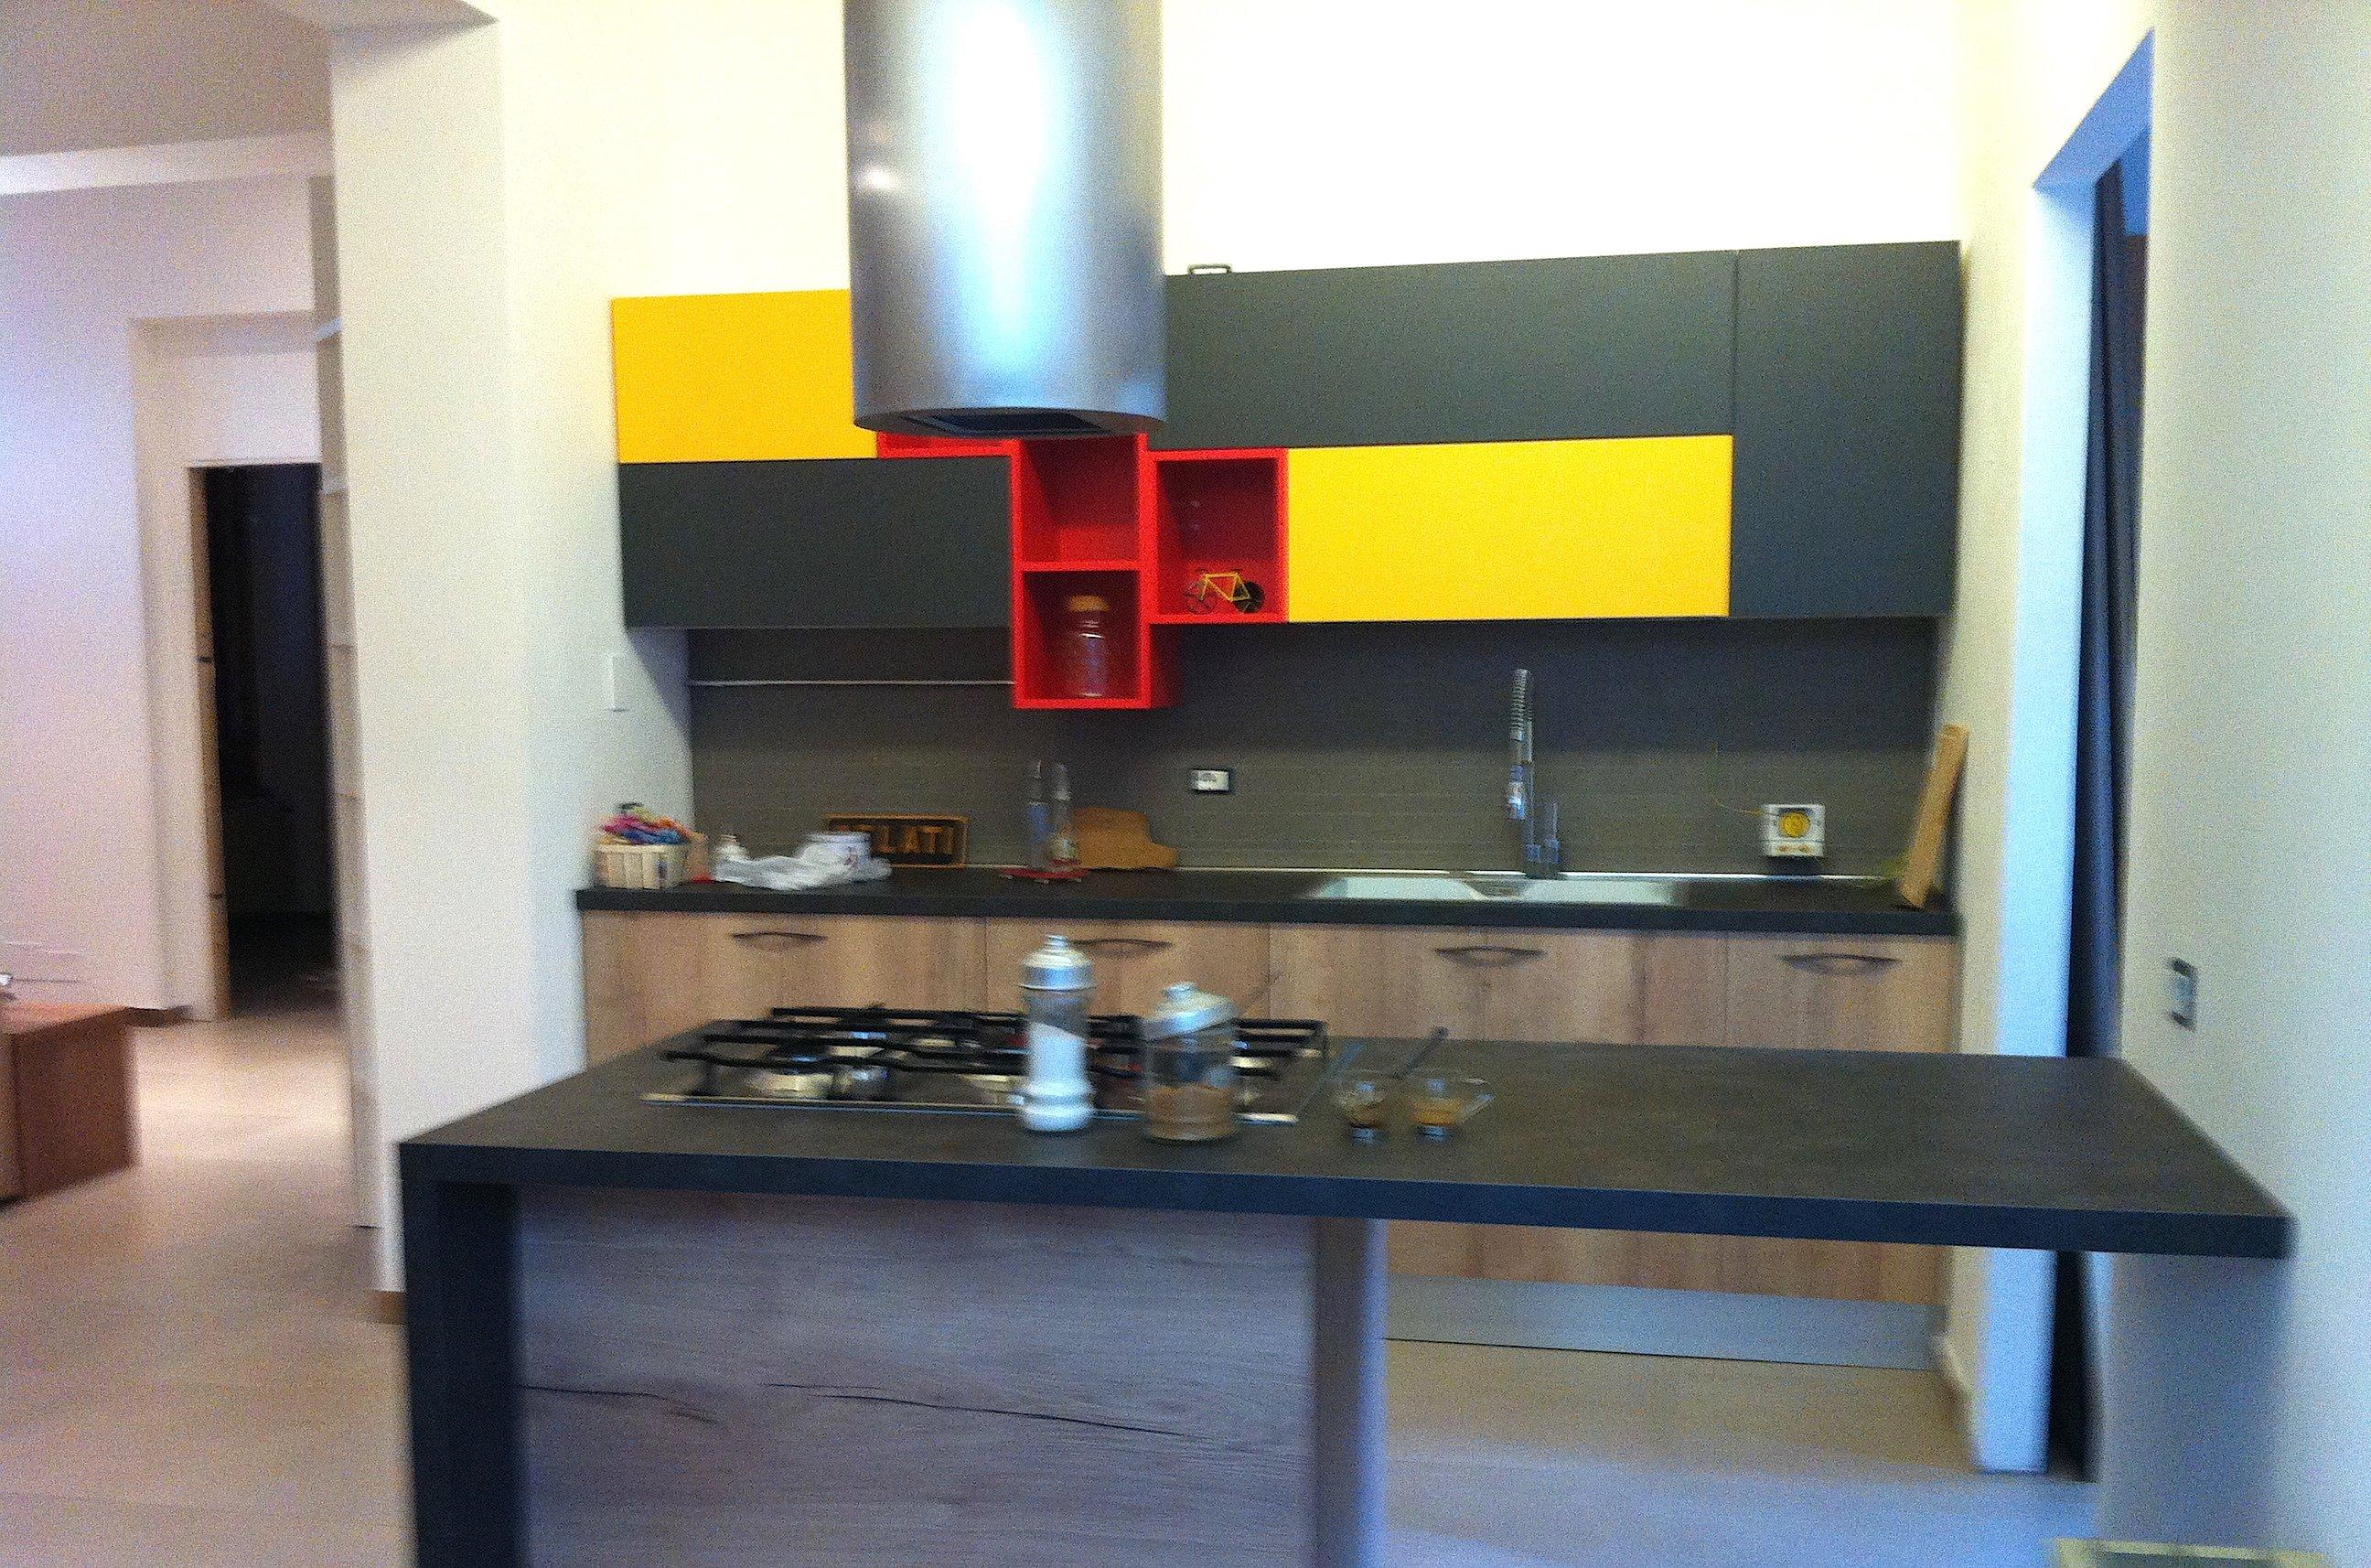 Come Arredare un Appartamento Moderno  Arredamento Casa e Cucina a Firenze